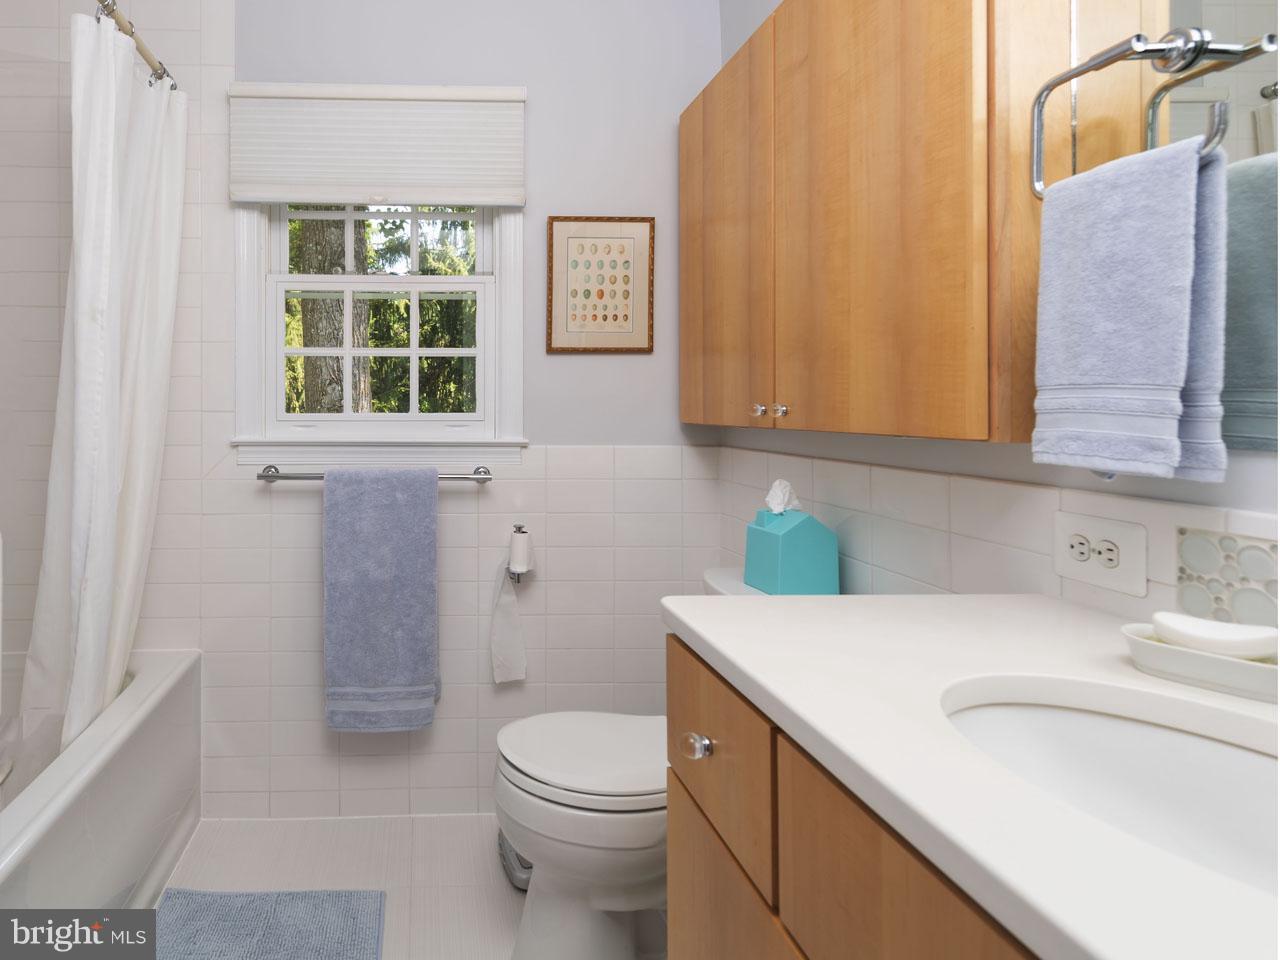 1006211278-300688039119-2021-07-22-07-39-39        Burke Delaware Real Estate For Sale   MLS# 1006211278  - Best of Northern Virginia